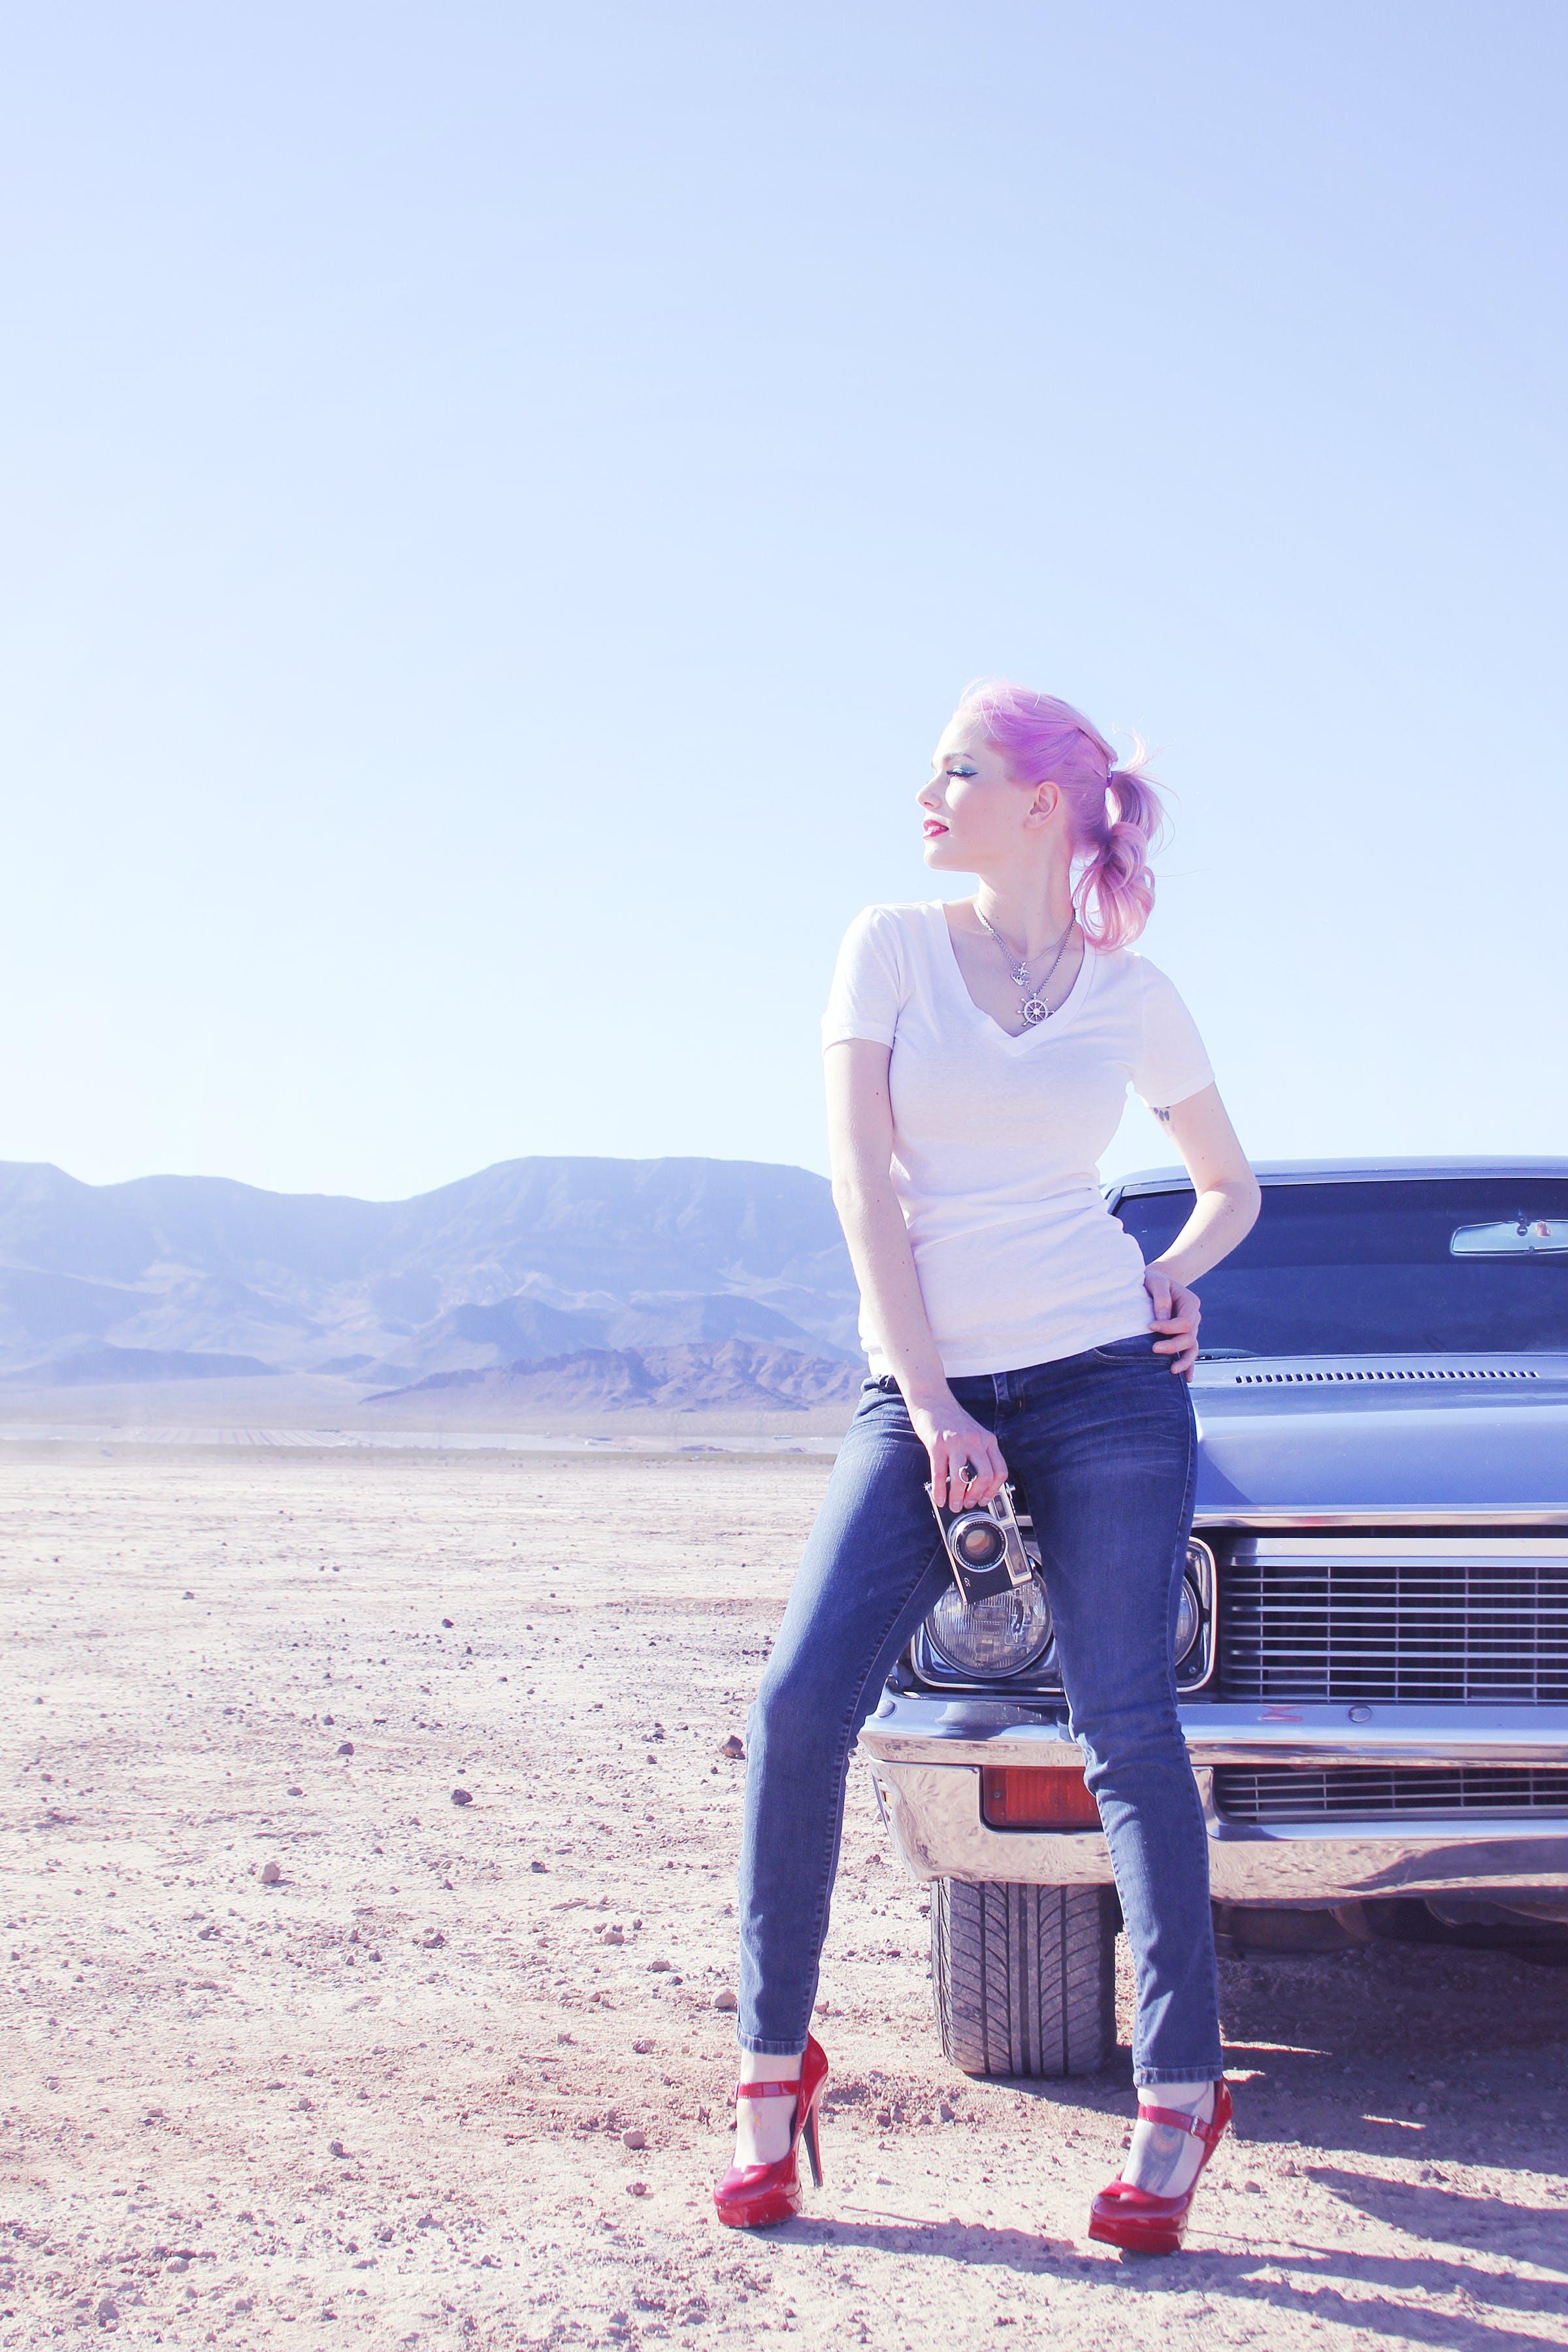 camera, car, desert